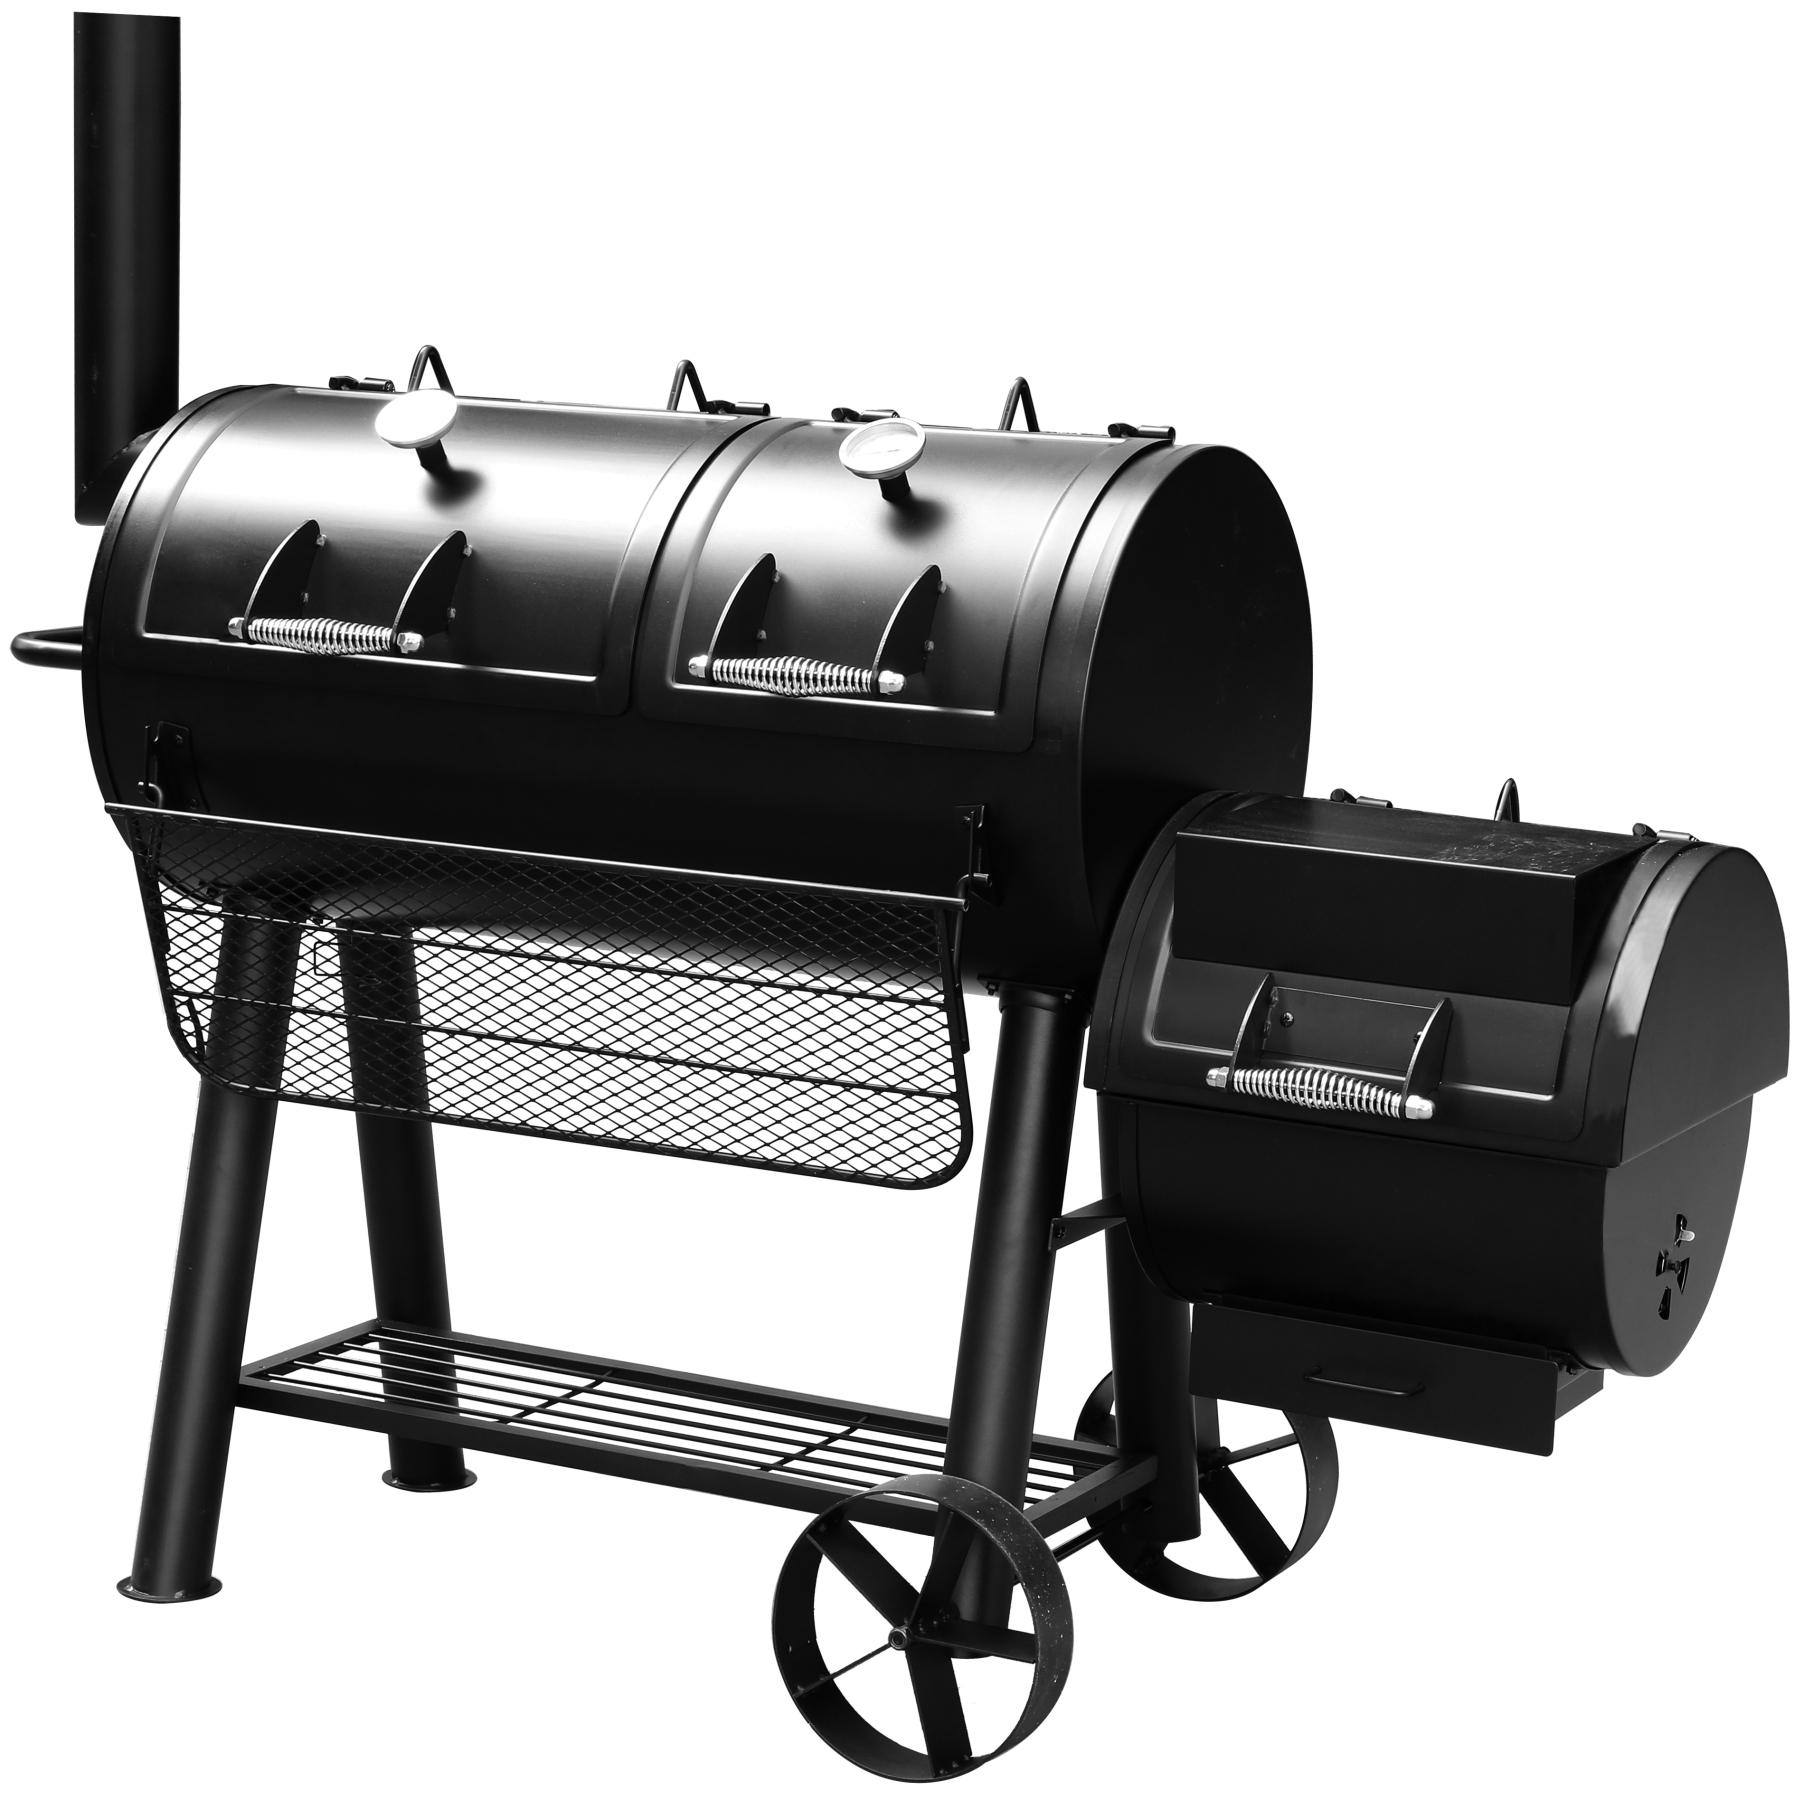 El Fuego Smoker Grill / Holzkohlegrill Minnesota Grillfläche 99x49cm Bild 1